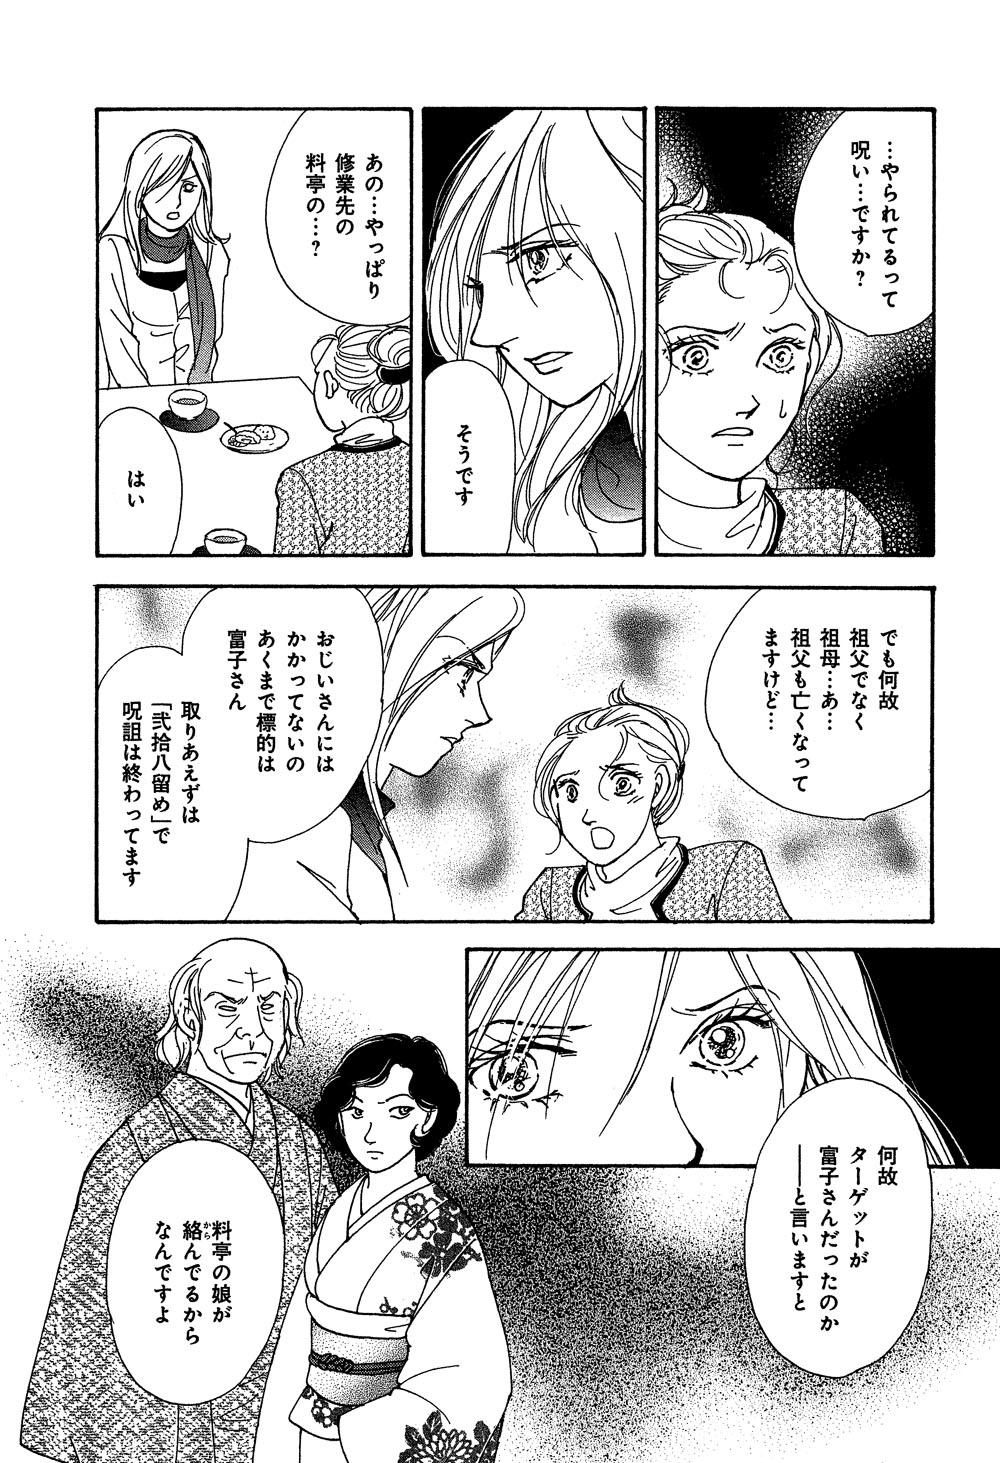 mayuri_0001_0148.jpg